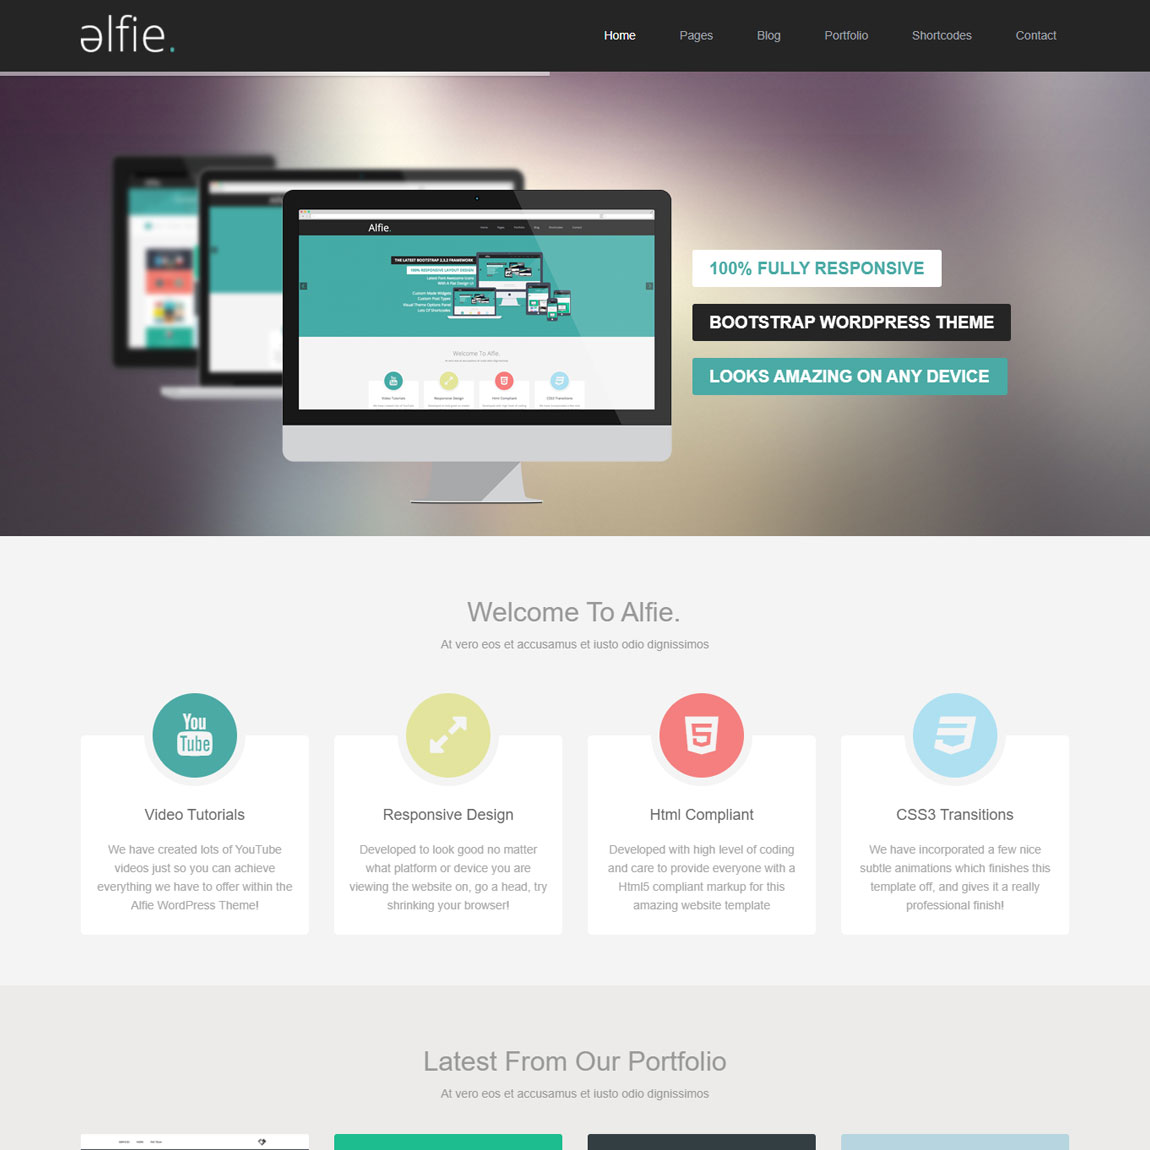 alfie-wordpress-bootstrap-theme